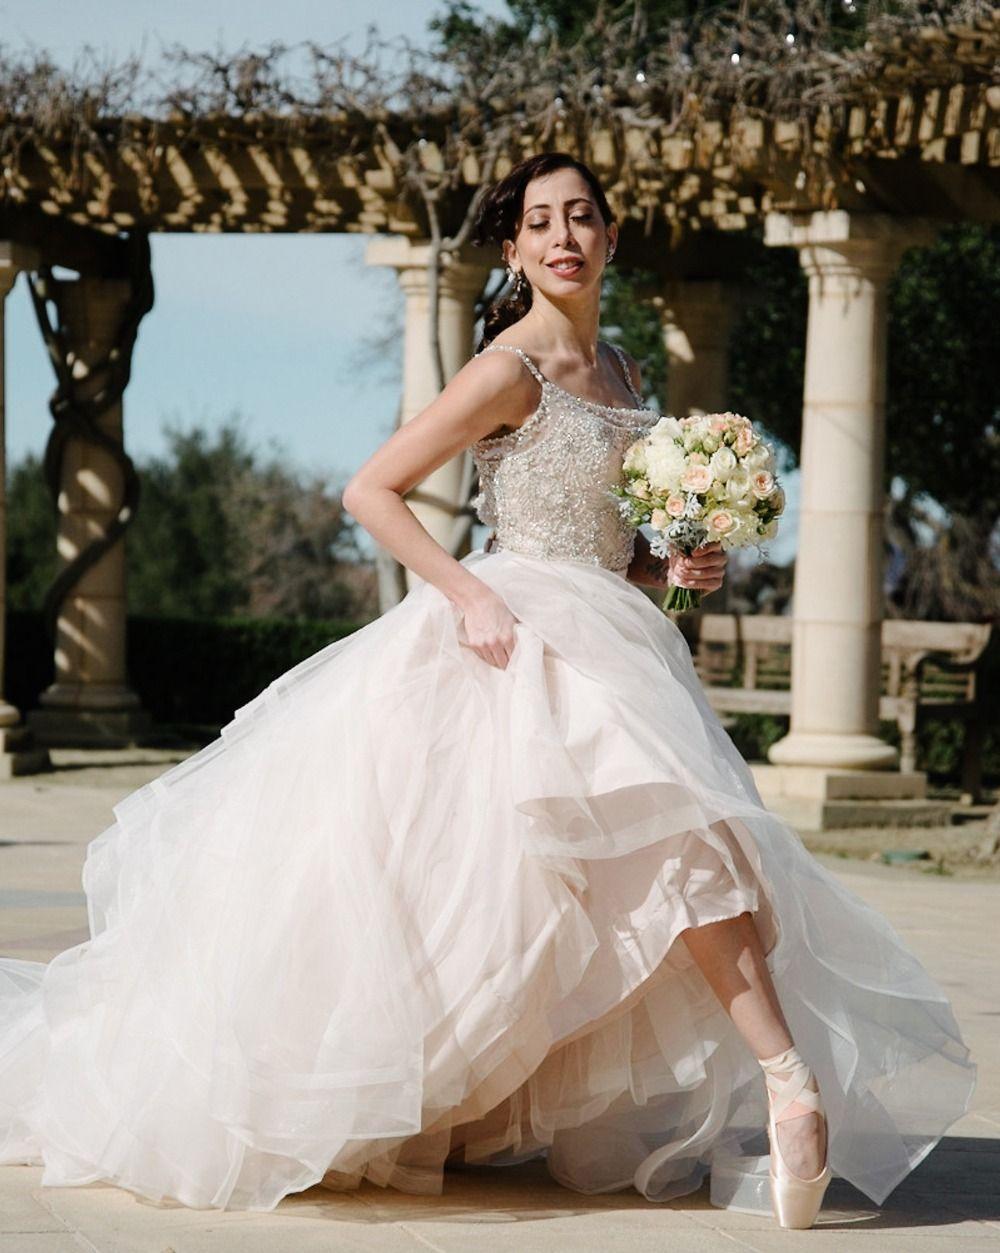 Prima Ballerina Wedding Inspiration With IRL Ballet Dancers ...